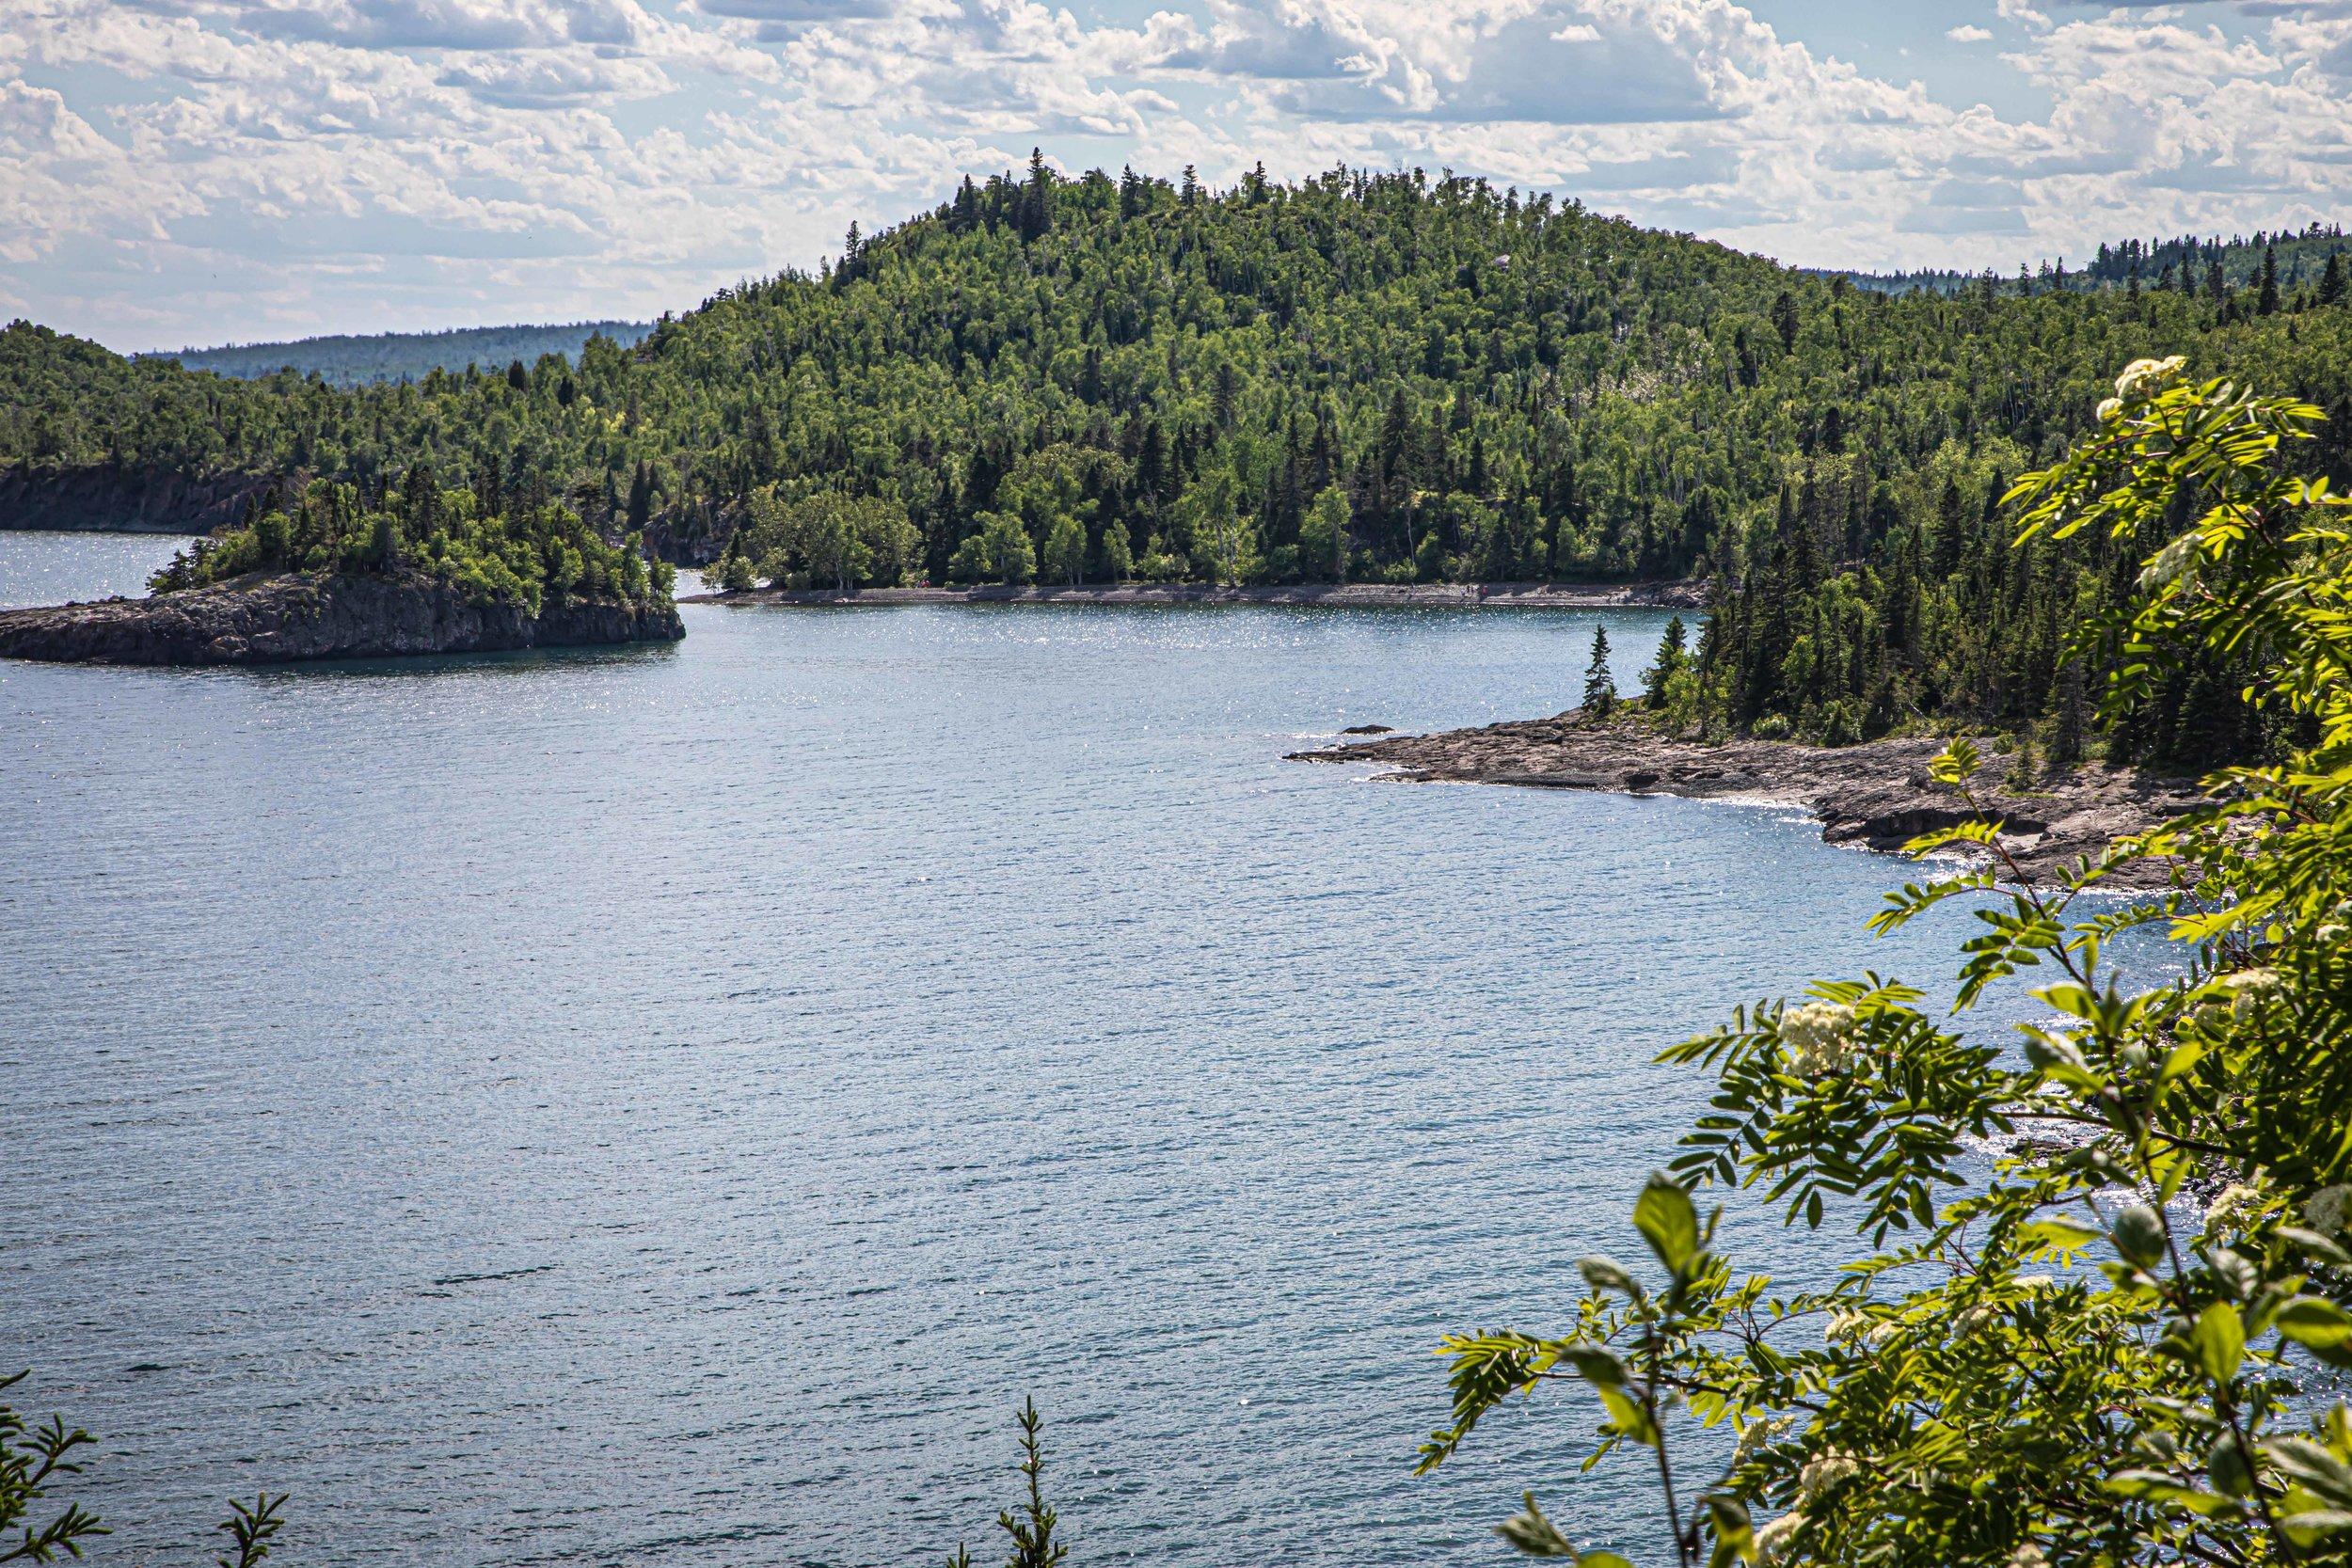 Minnesota North Shore: Superior Lakeshore View